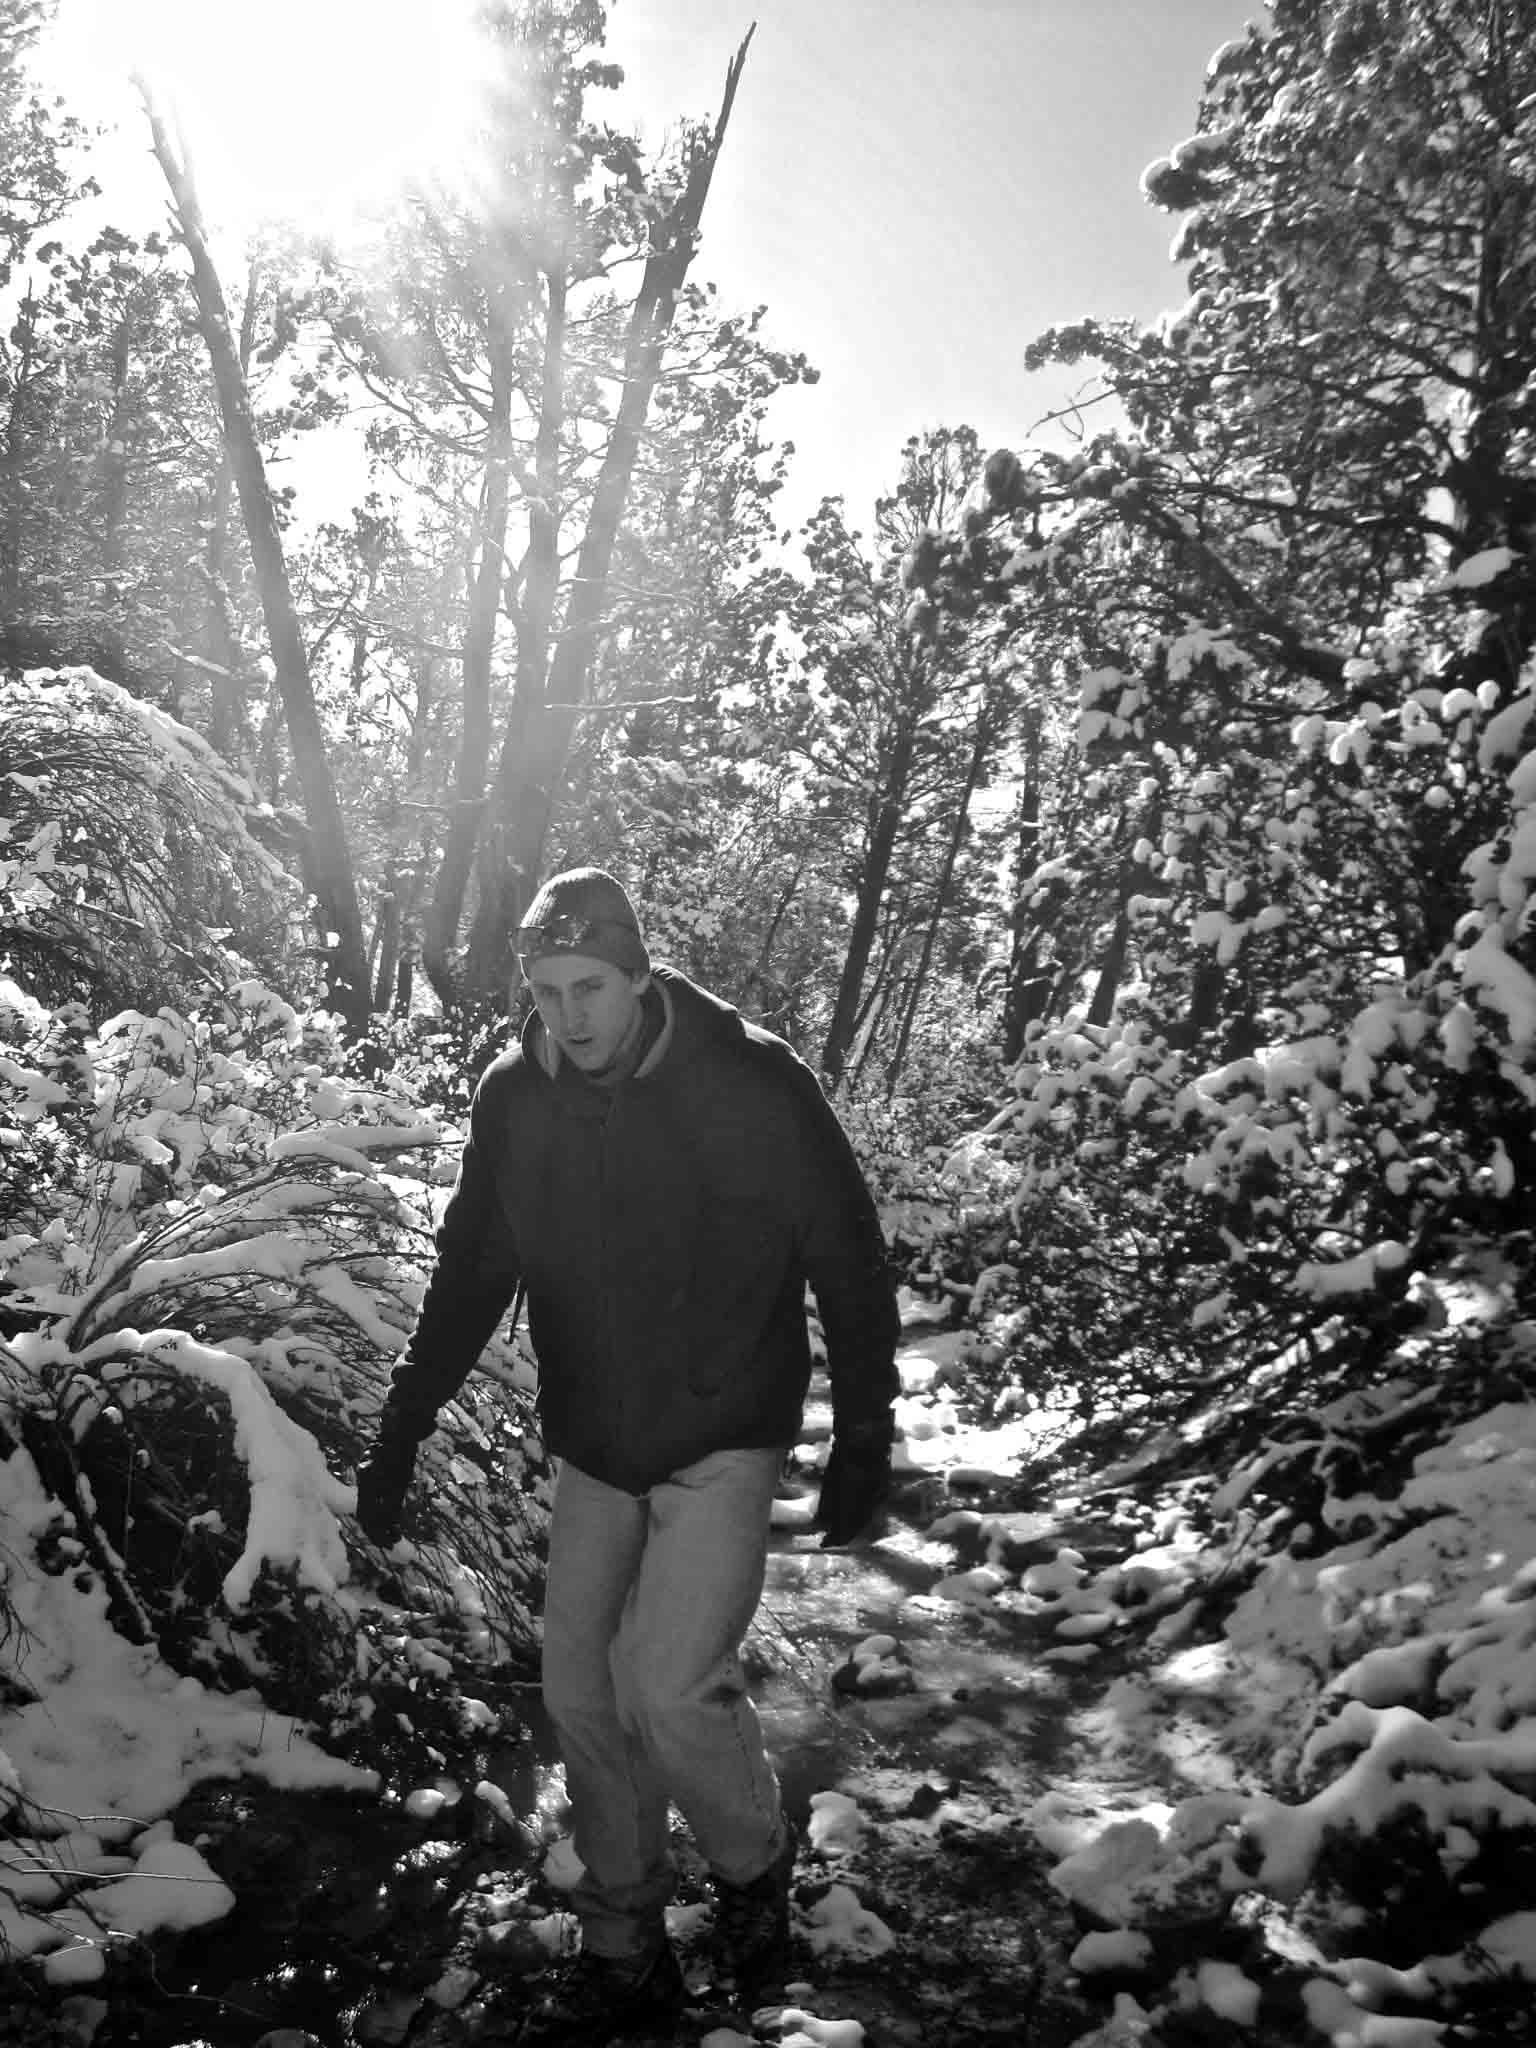 Chuck Demas at Soldiers' Pass, Sedona, Arizona, January 2011